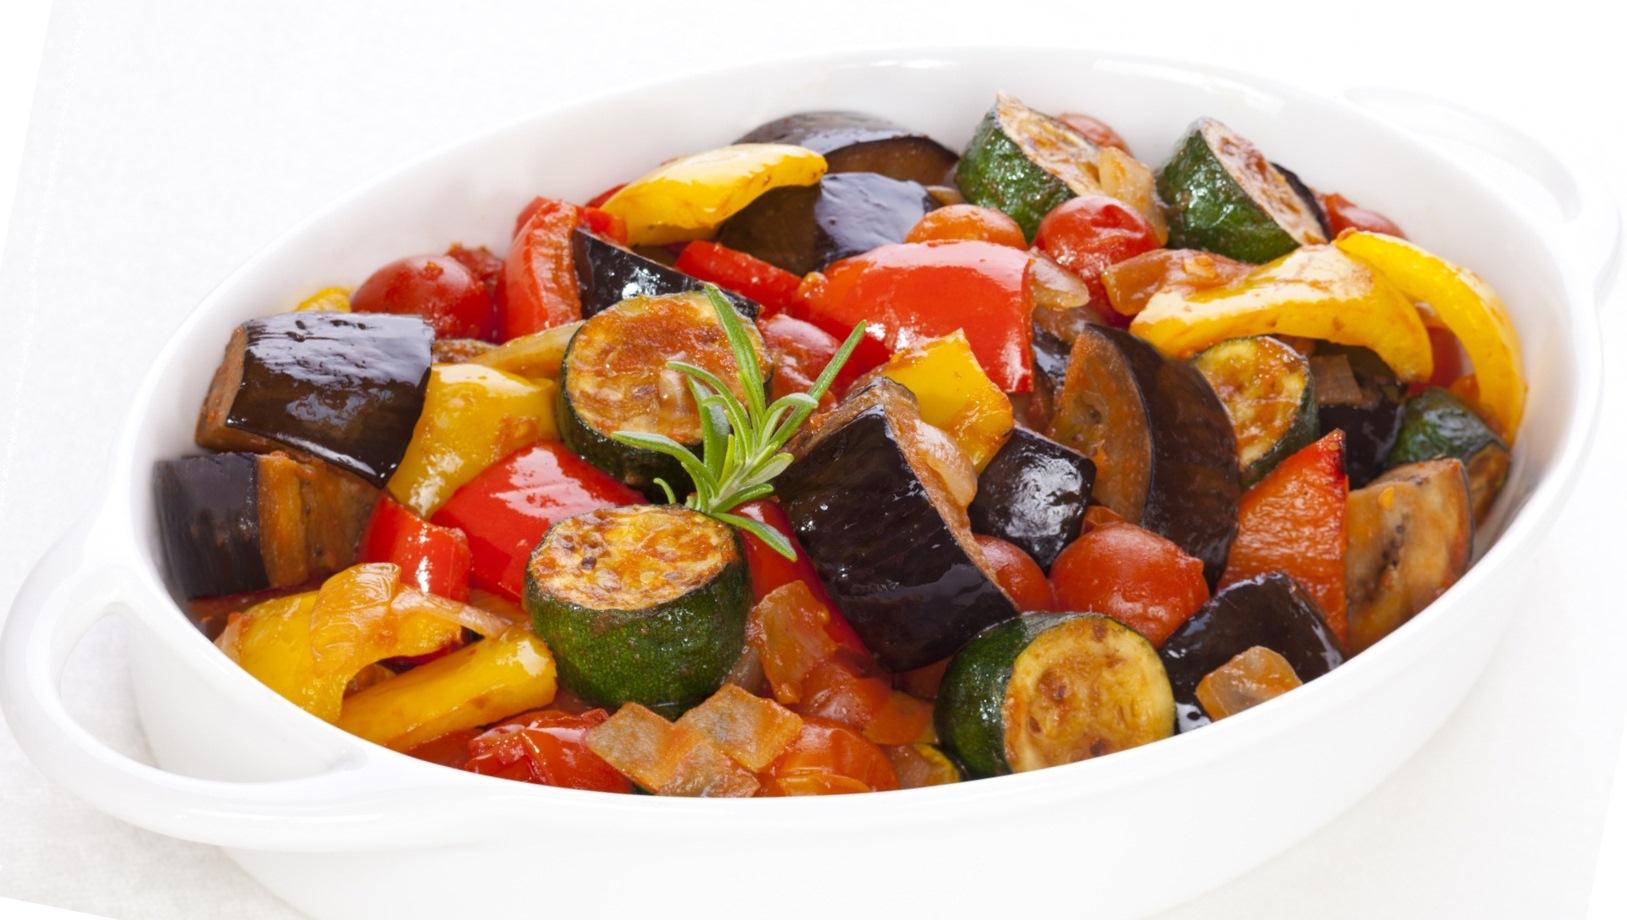 вам картинка тушеные овощи спектр